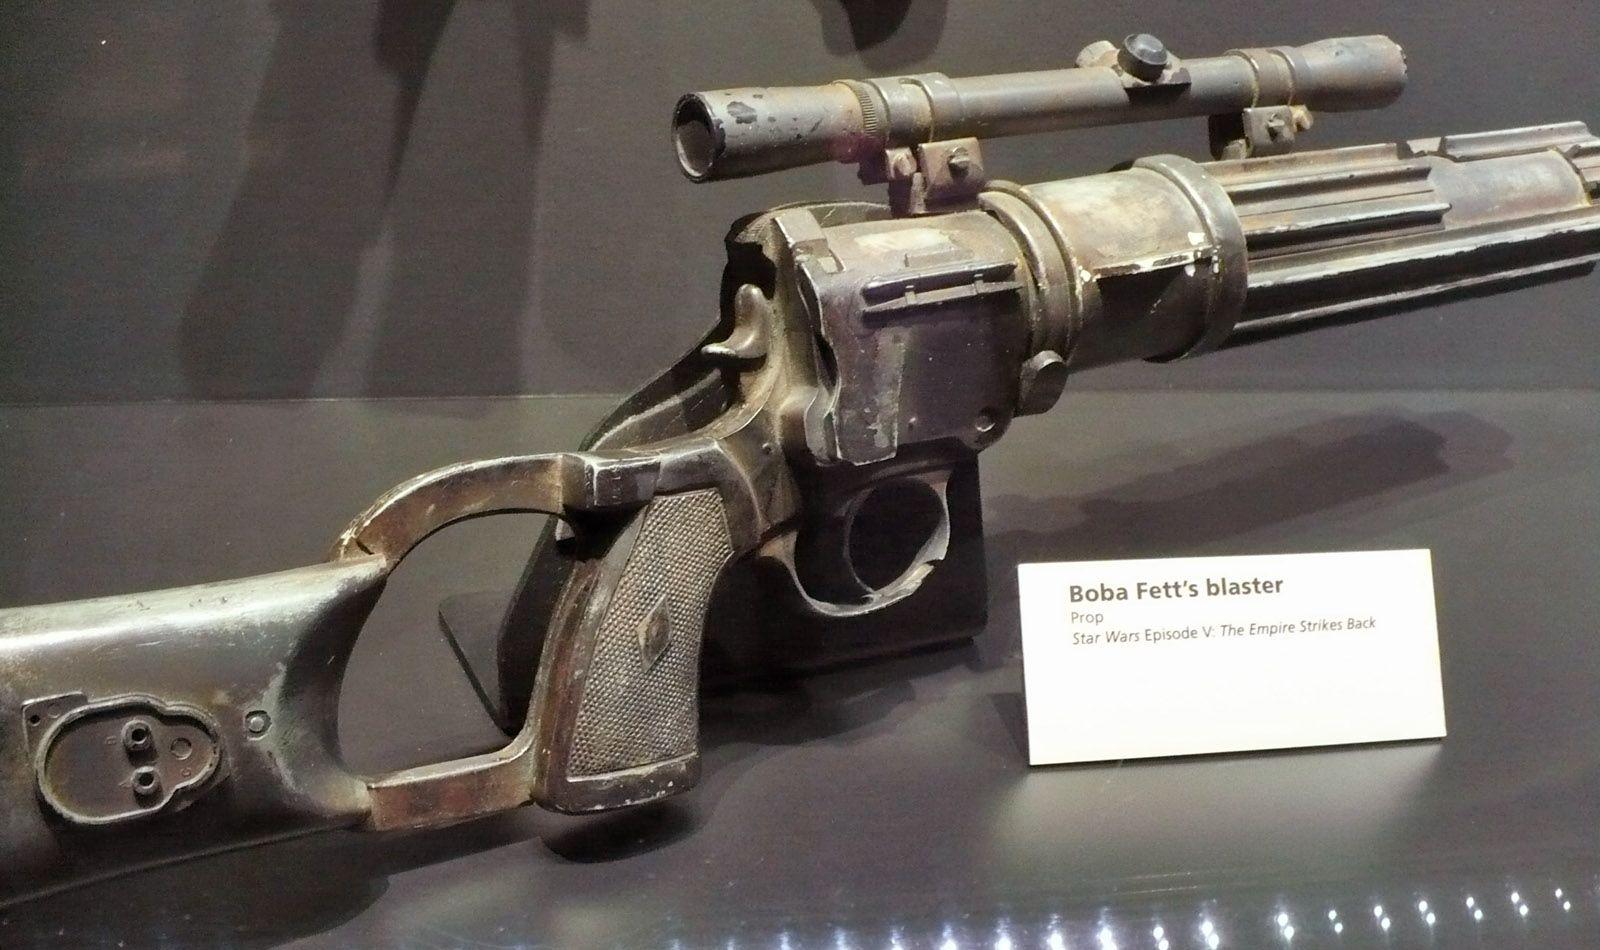 Boba Fett Rotj Blaster Blastech Ee 3 Classic Trilogy